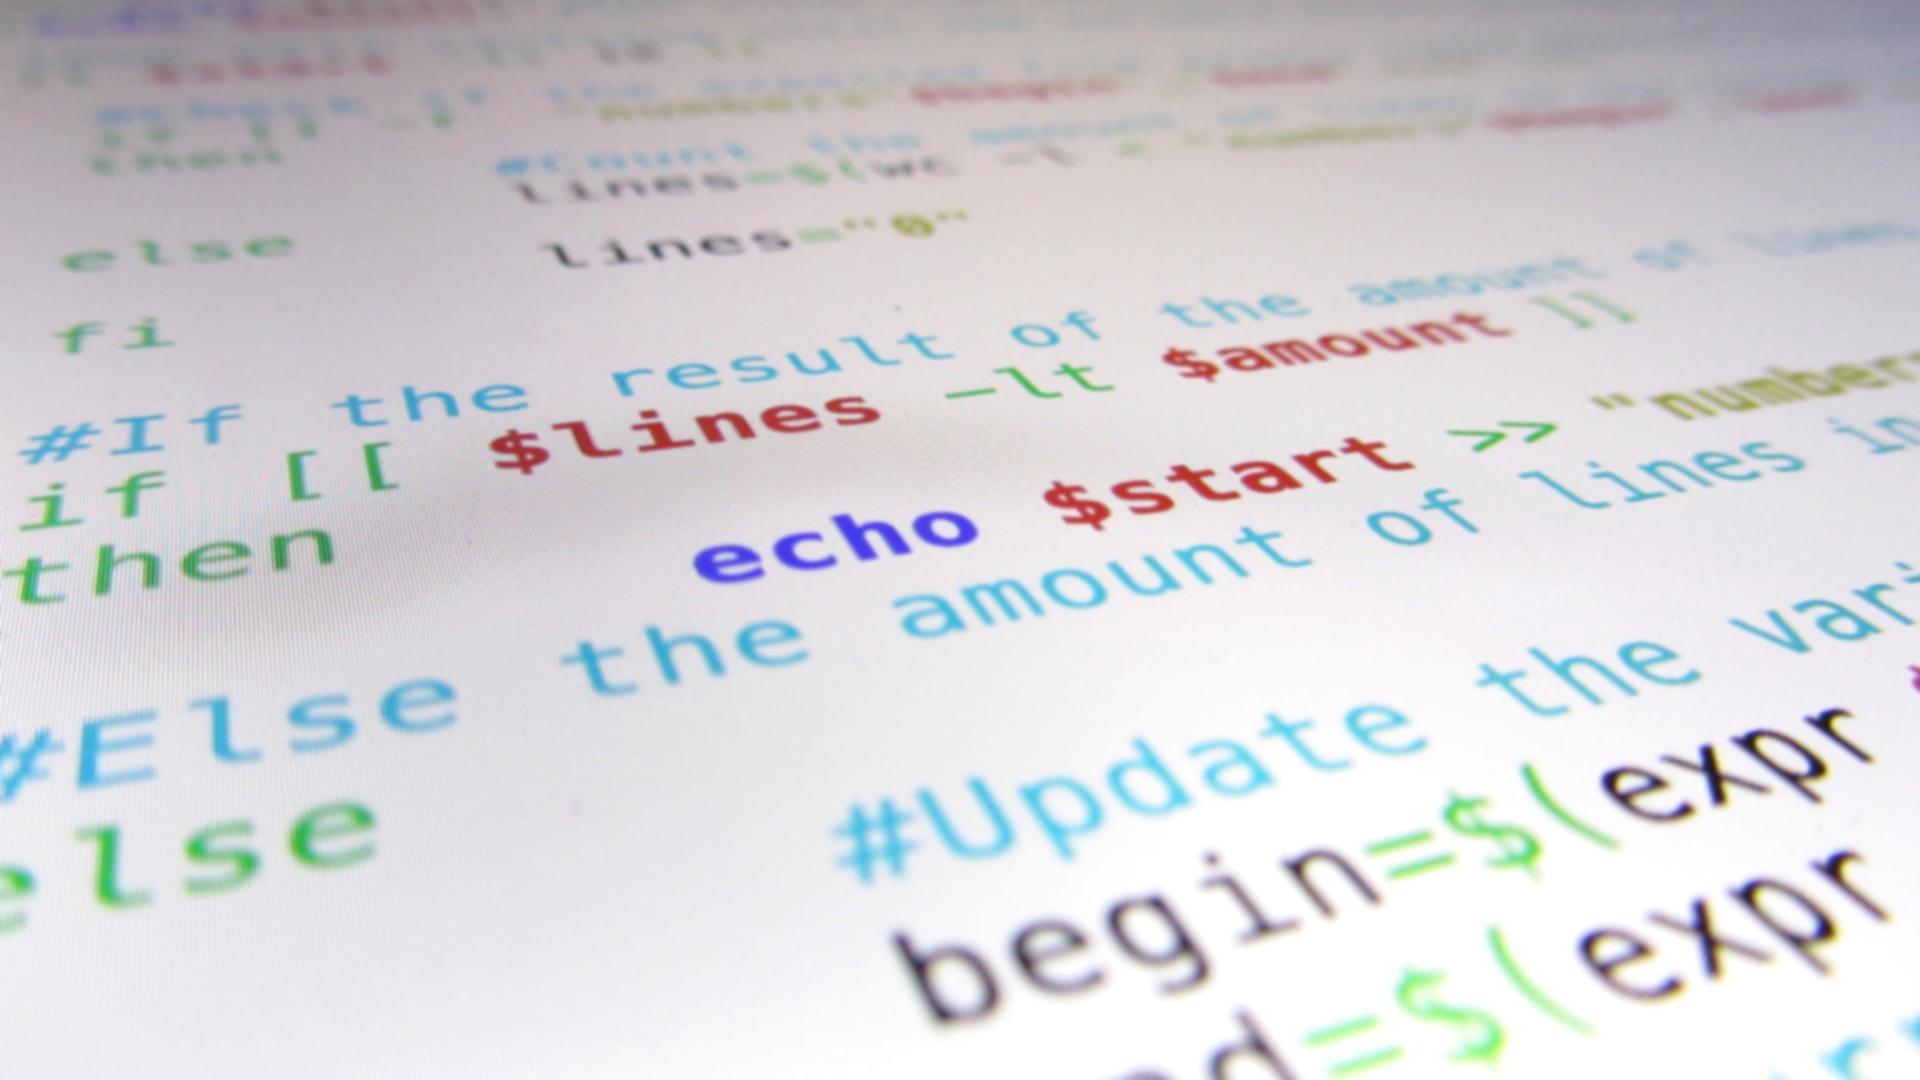 Code van shell script dat dynamisch uitkomst splitst